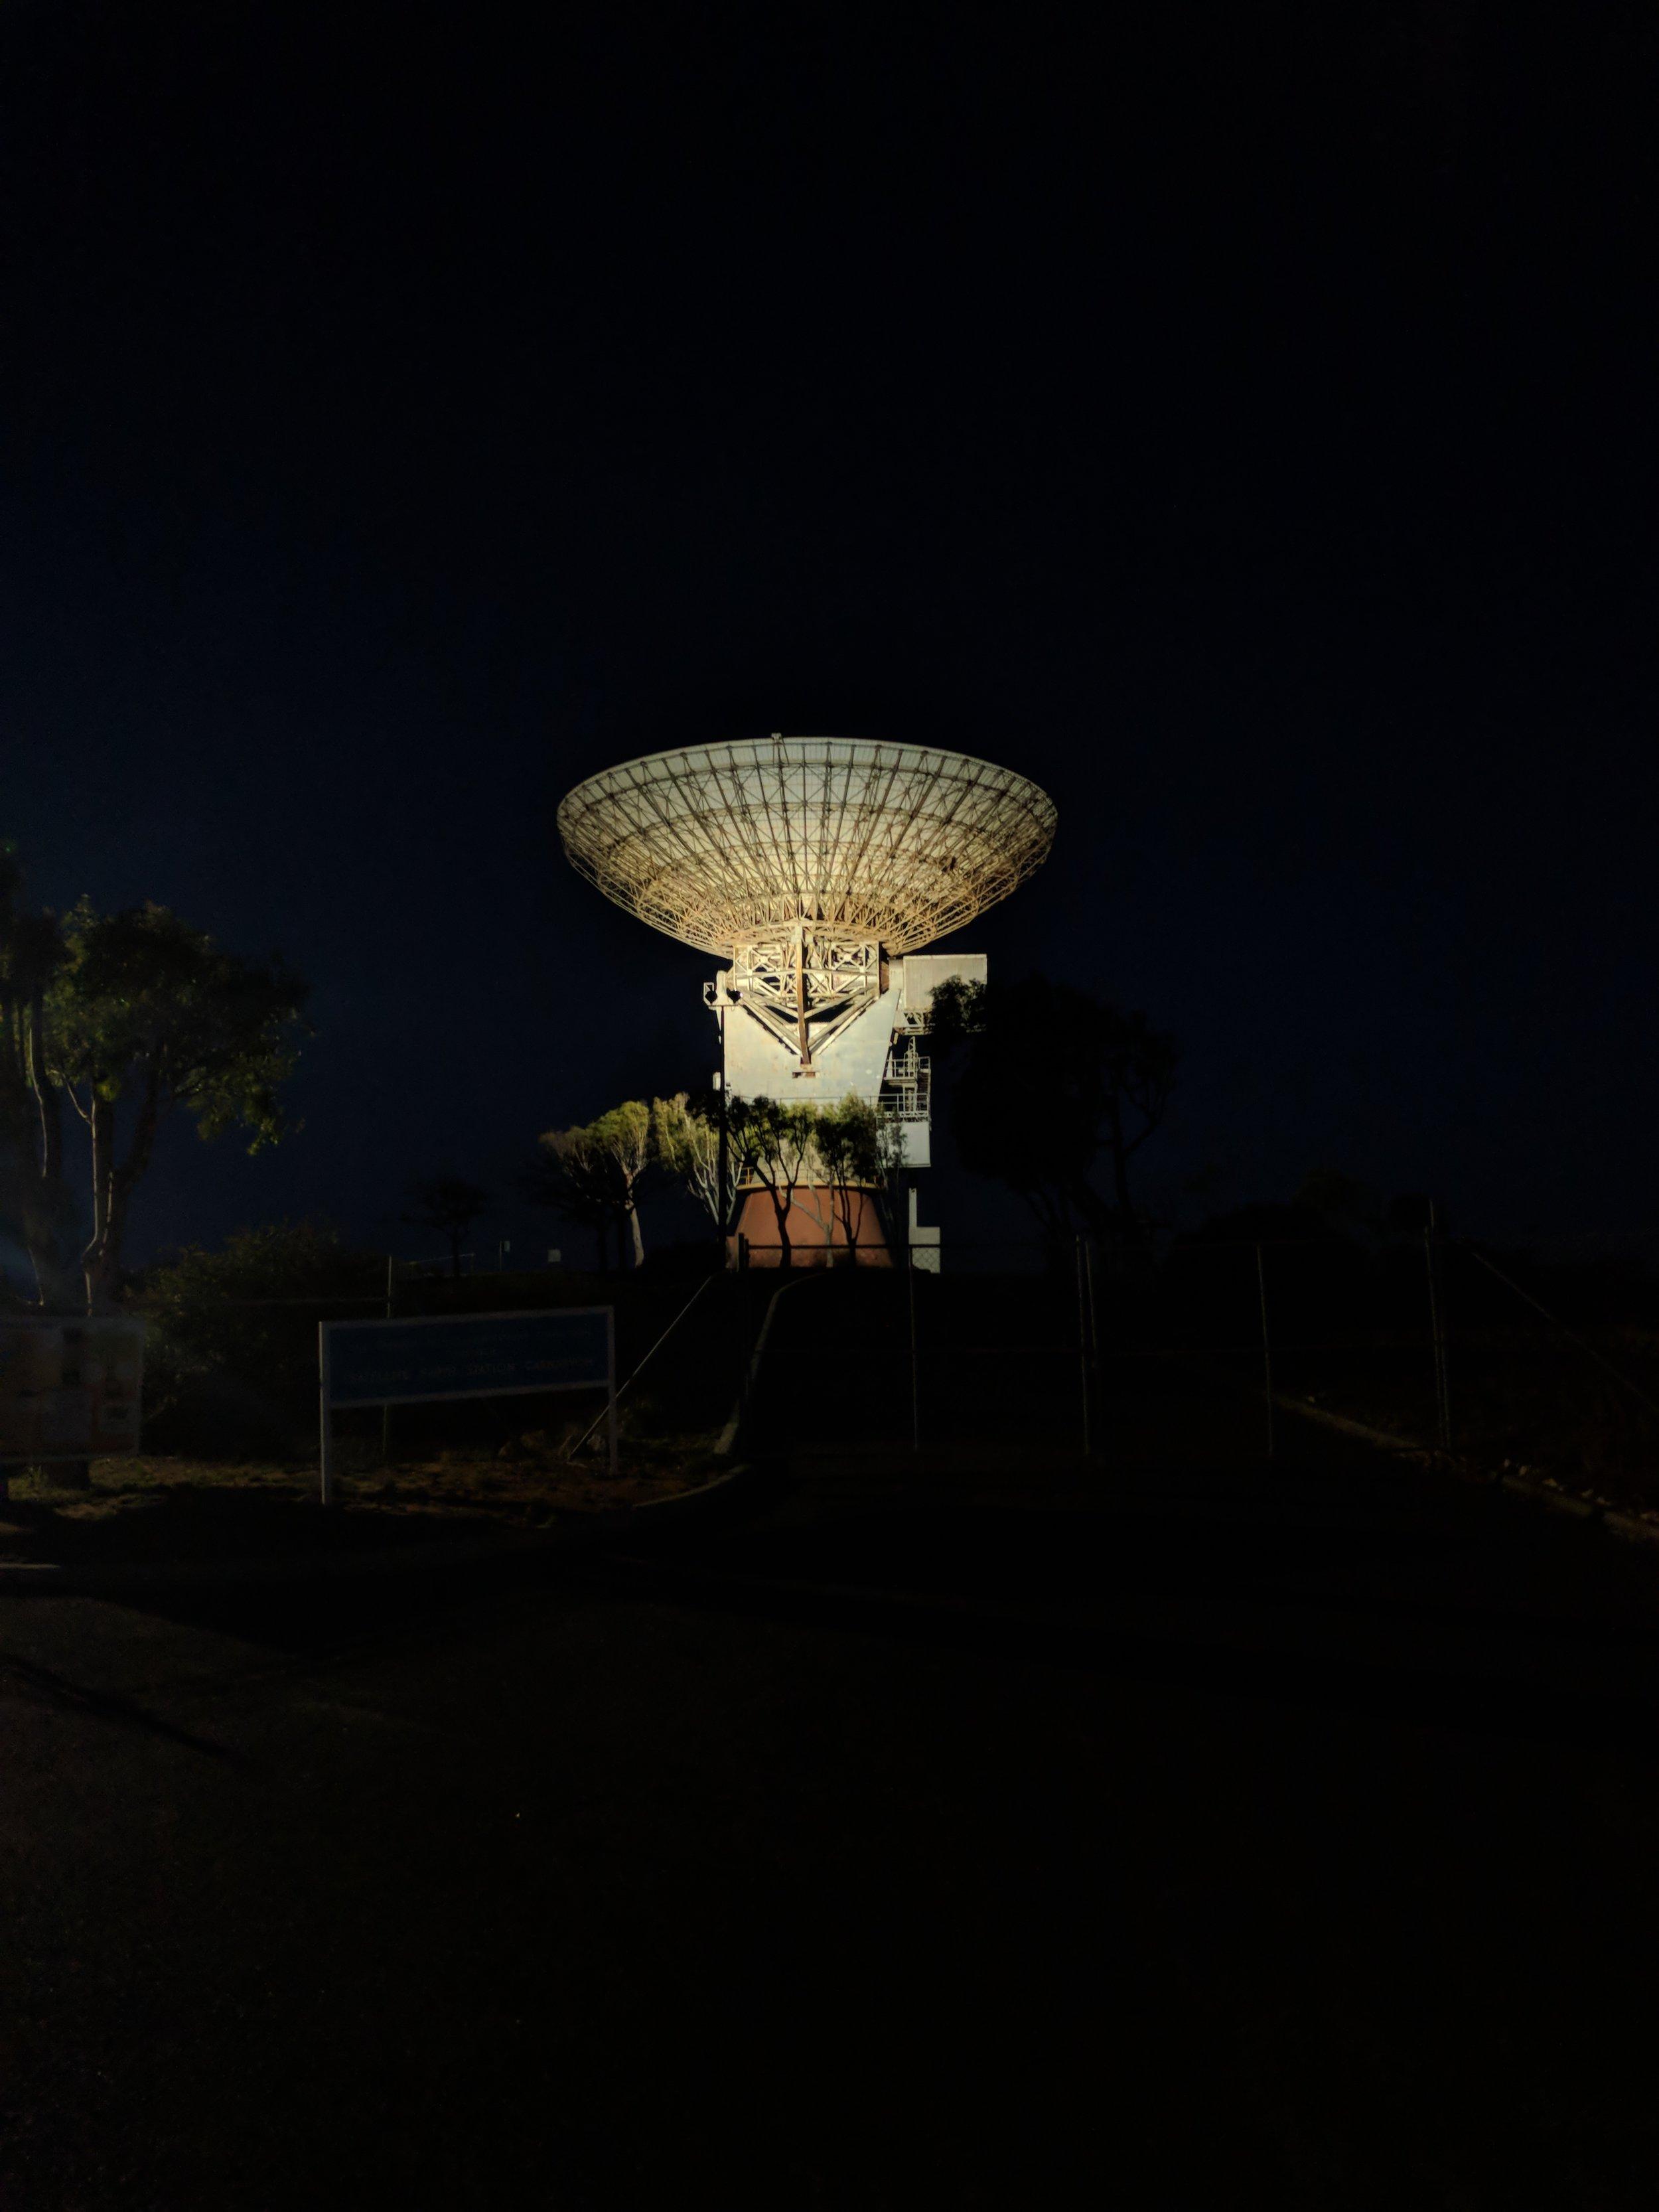 The OTC dish by night, uplighting done right!